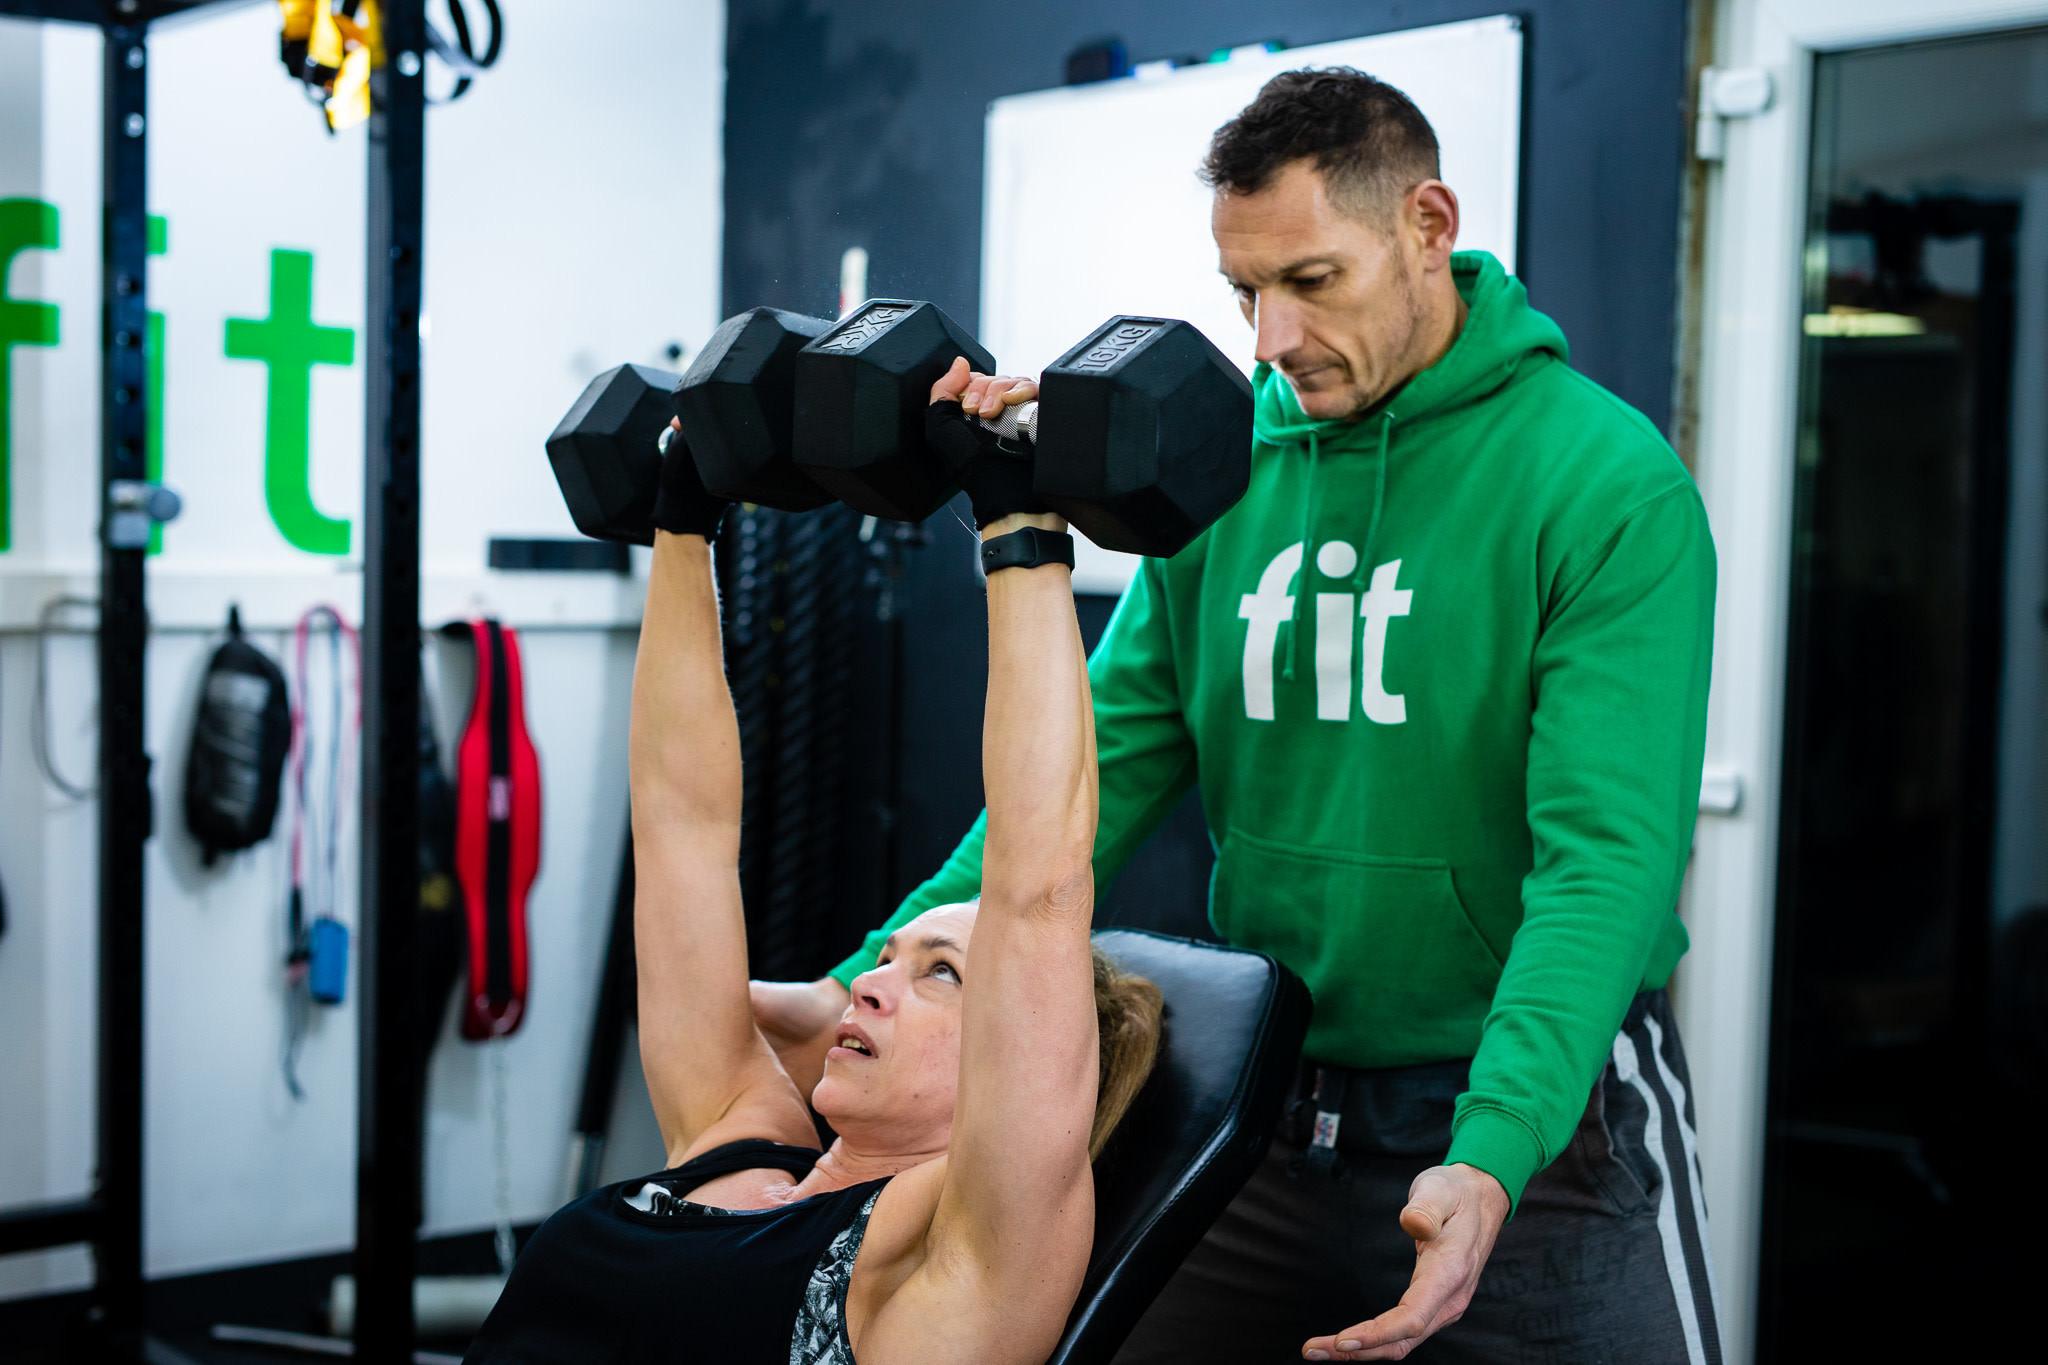 For Inspirational Training Personal Trainer Classes Bradford On Avon